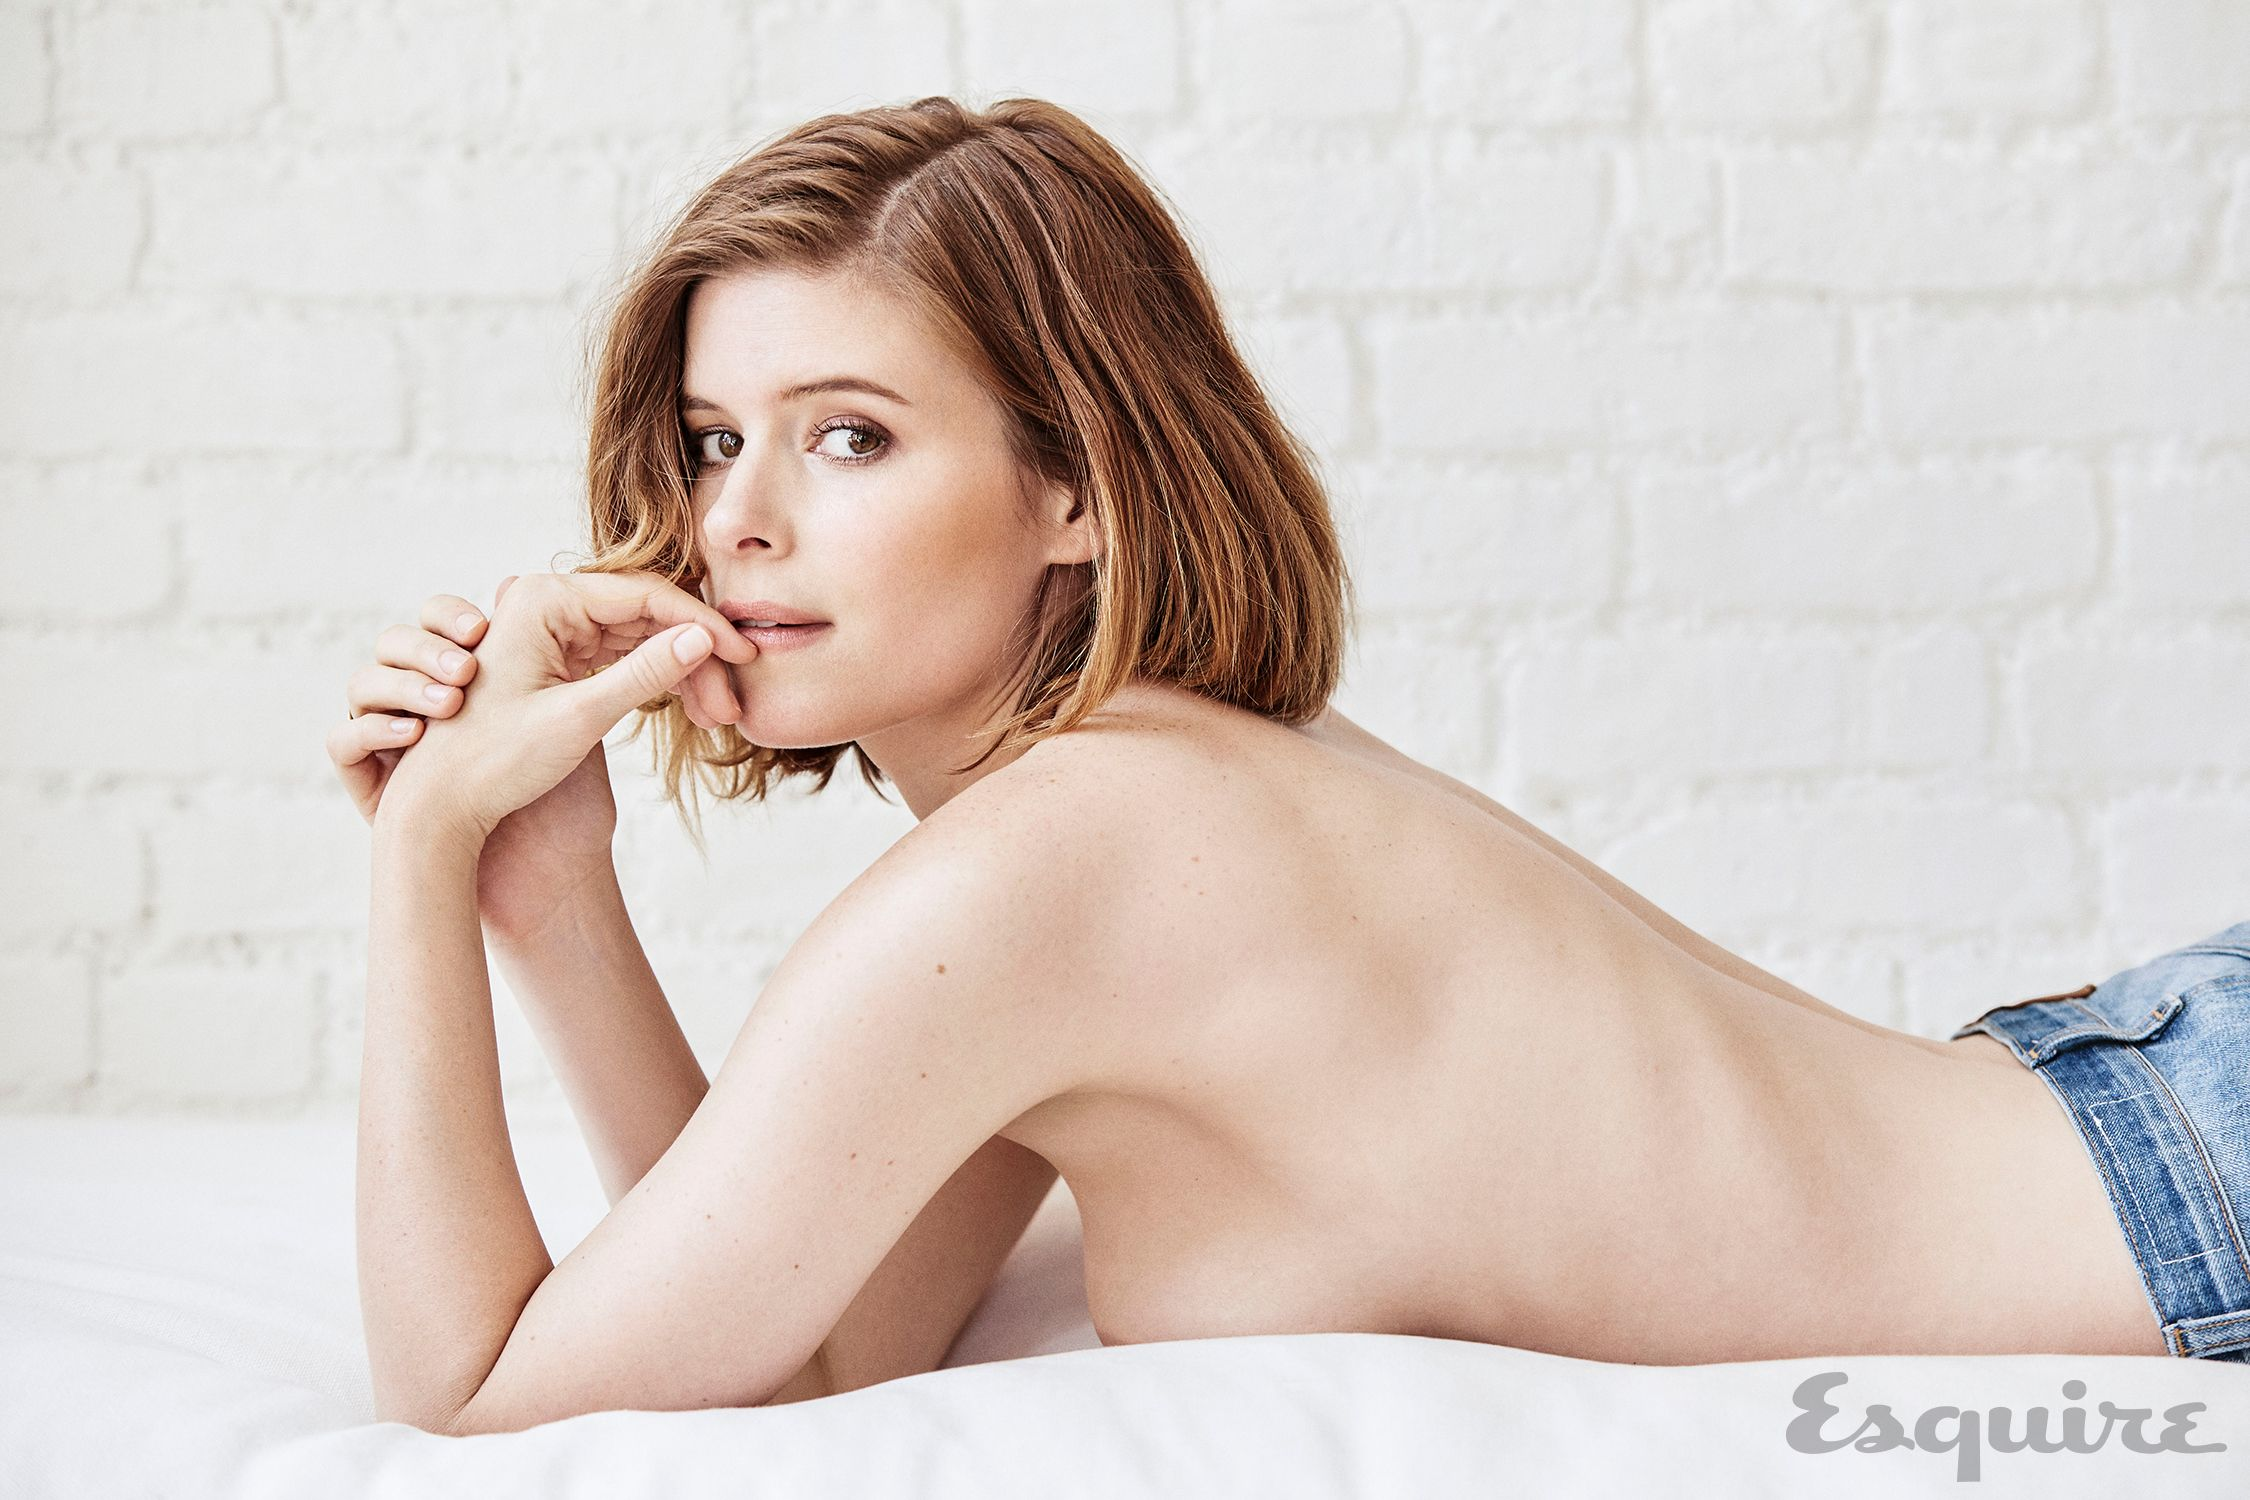 naked and beautiful women